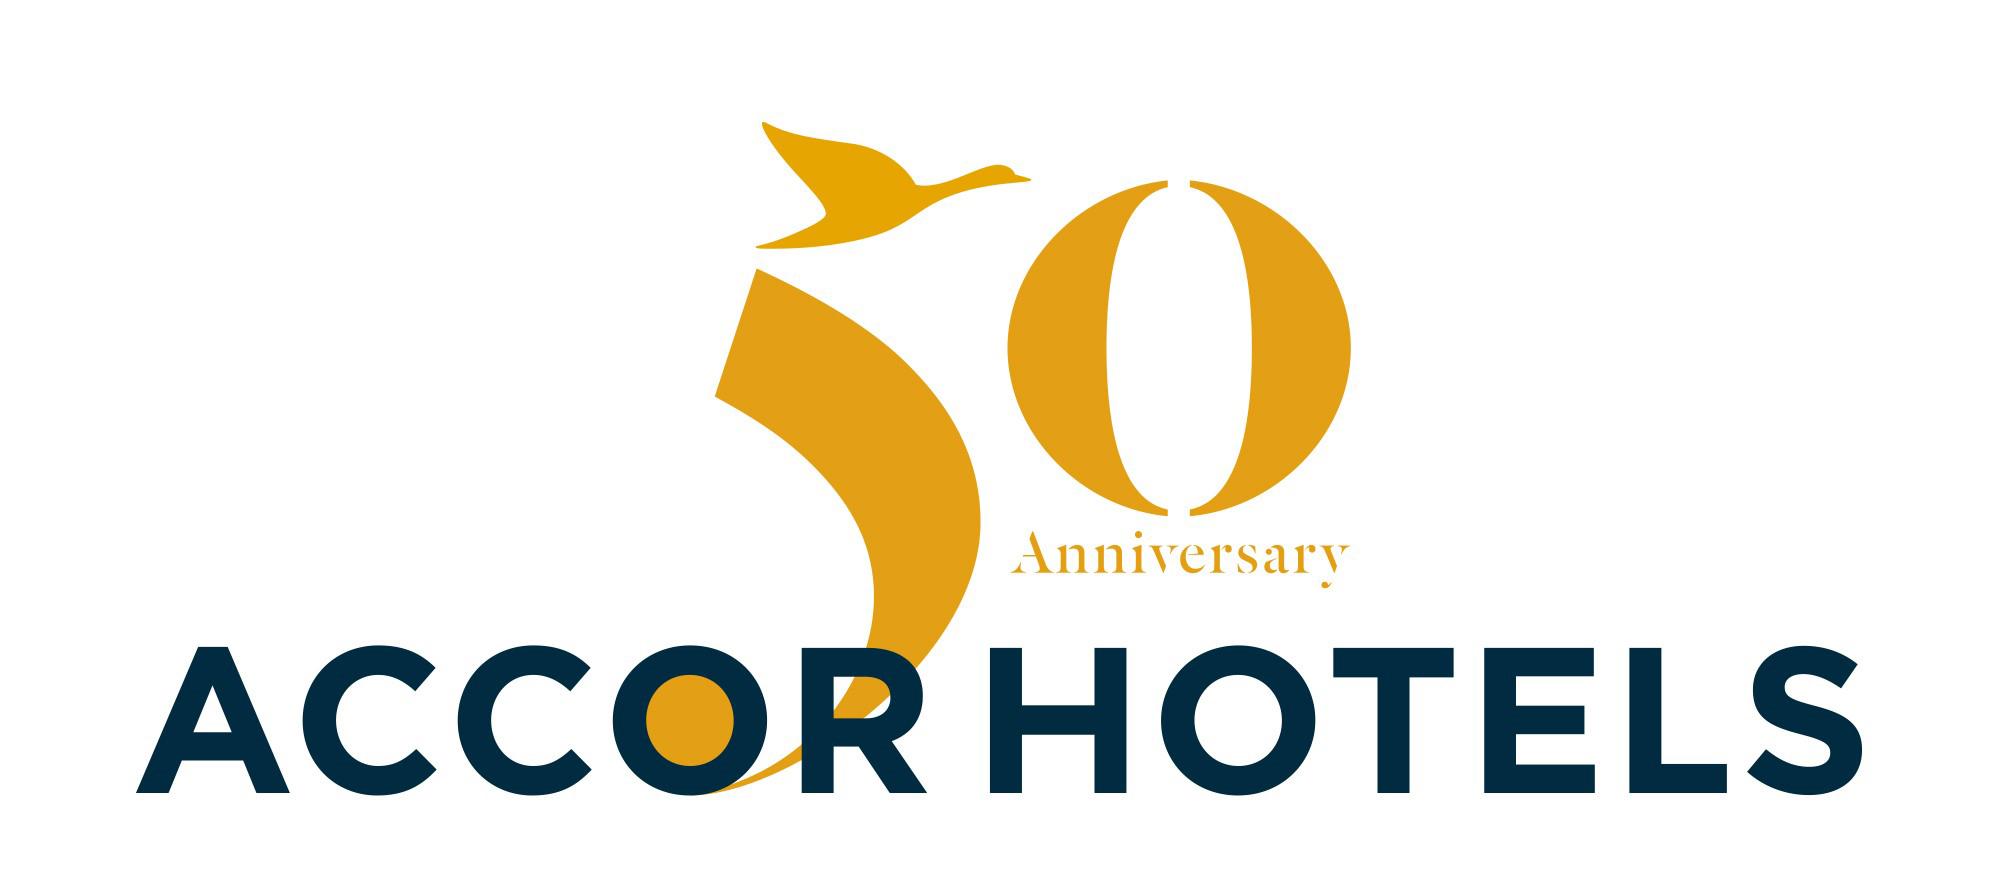 accorhotels celebrates its 50th anniversary accorhotels rh press accorhotels group 50th anniversary logo design 50th anniversary logos 50 years